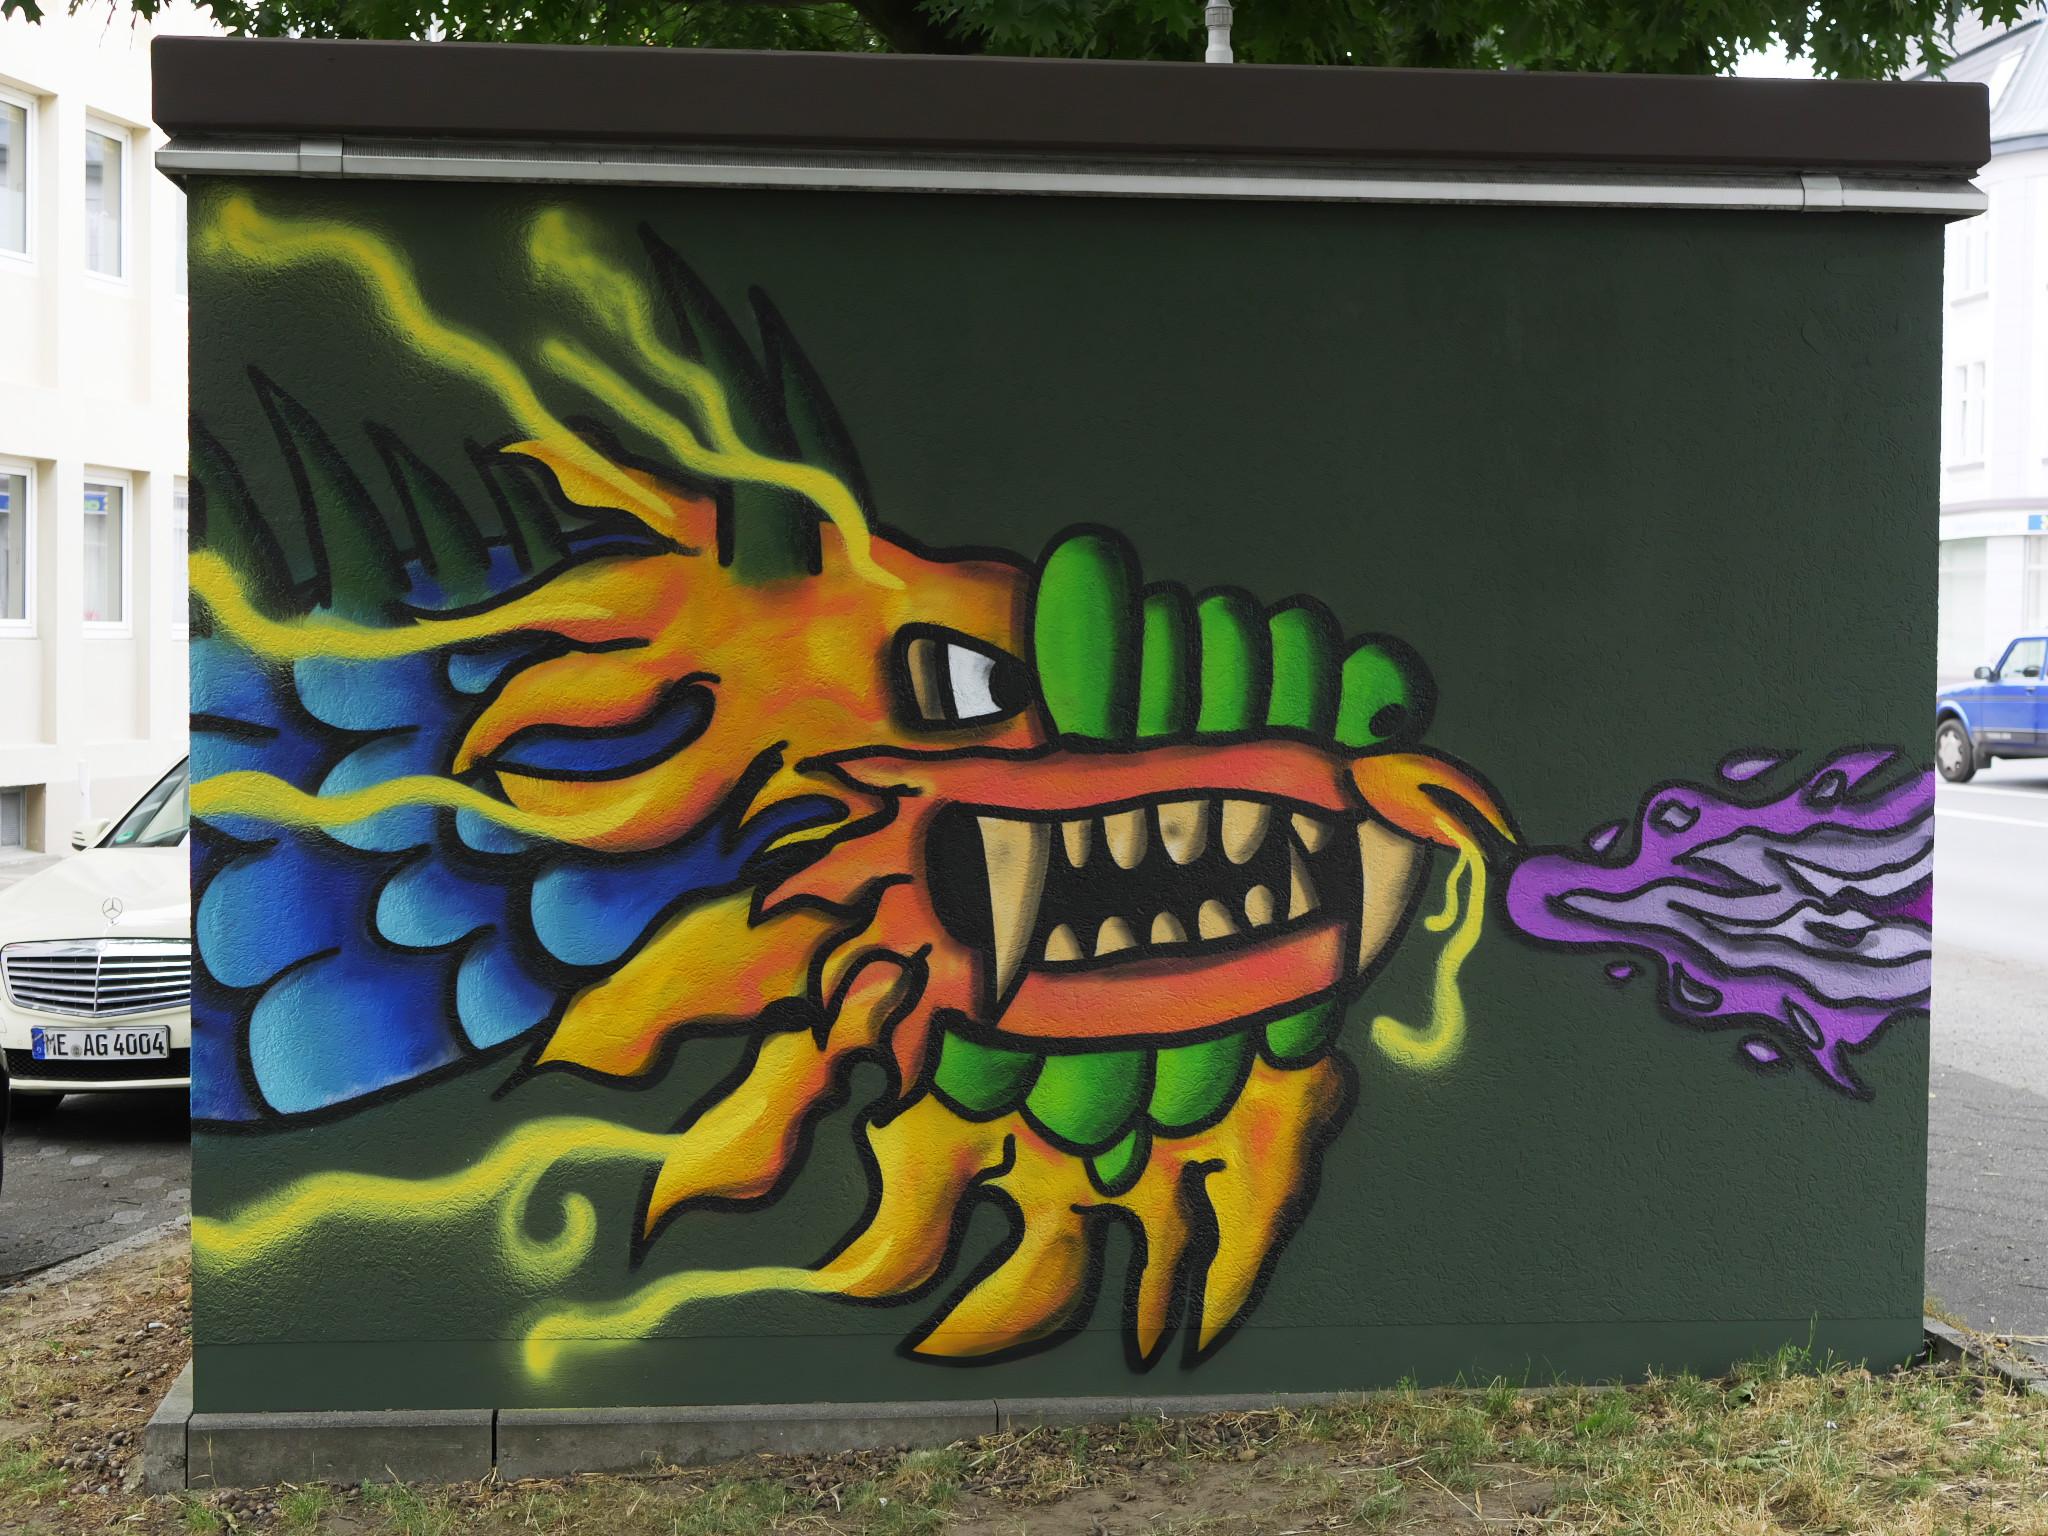 jugendkulturjahr-2020-ratingen-Grafitti-drache01